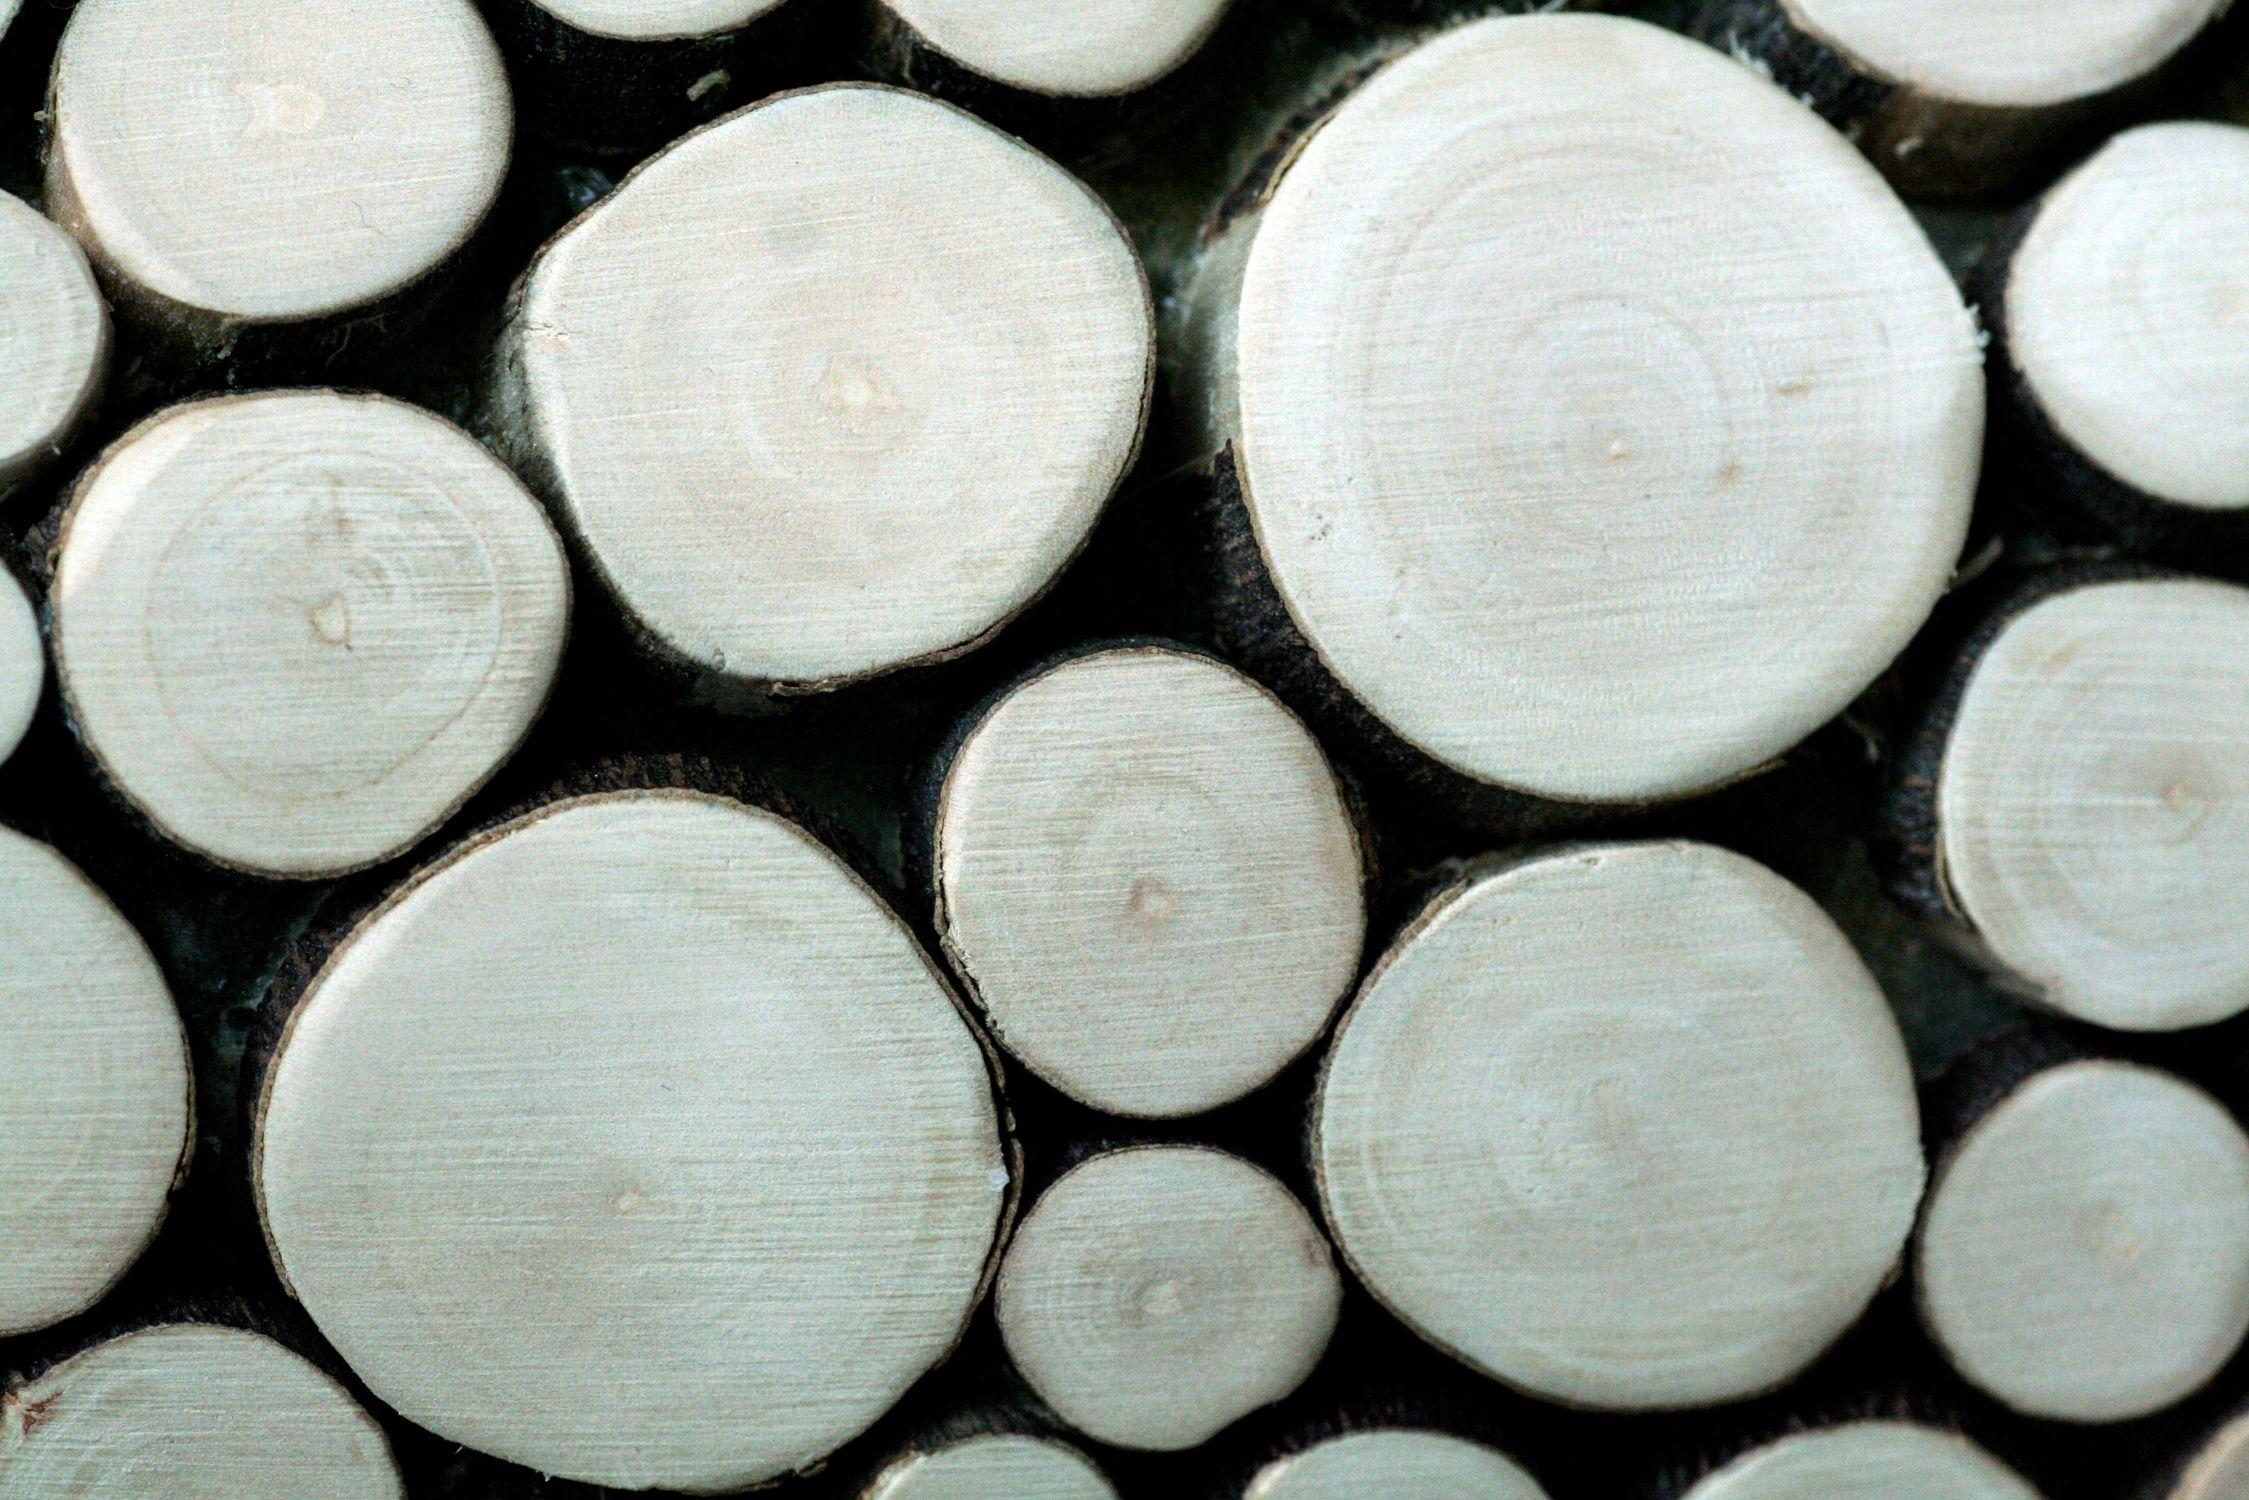 Bild mit Gegenstände, Materialien, Holz, Holz, Struktur, Holzstruktur, Hölzer